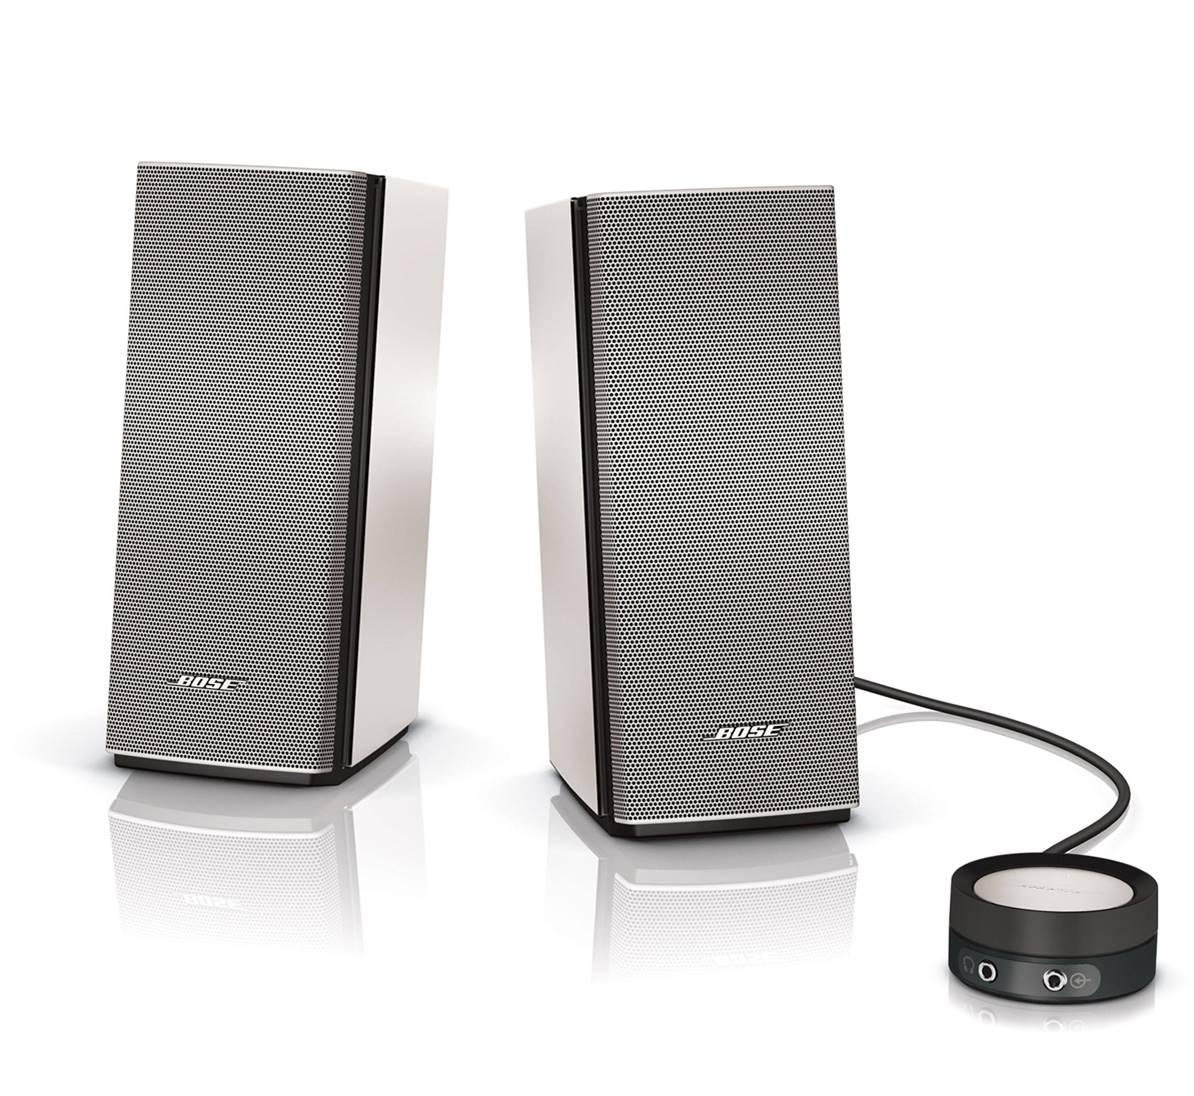 Bose Companion 20 Multi-media Speakers